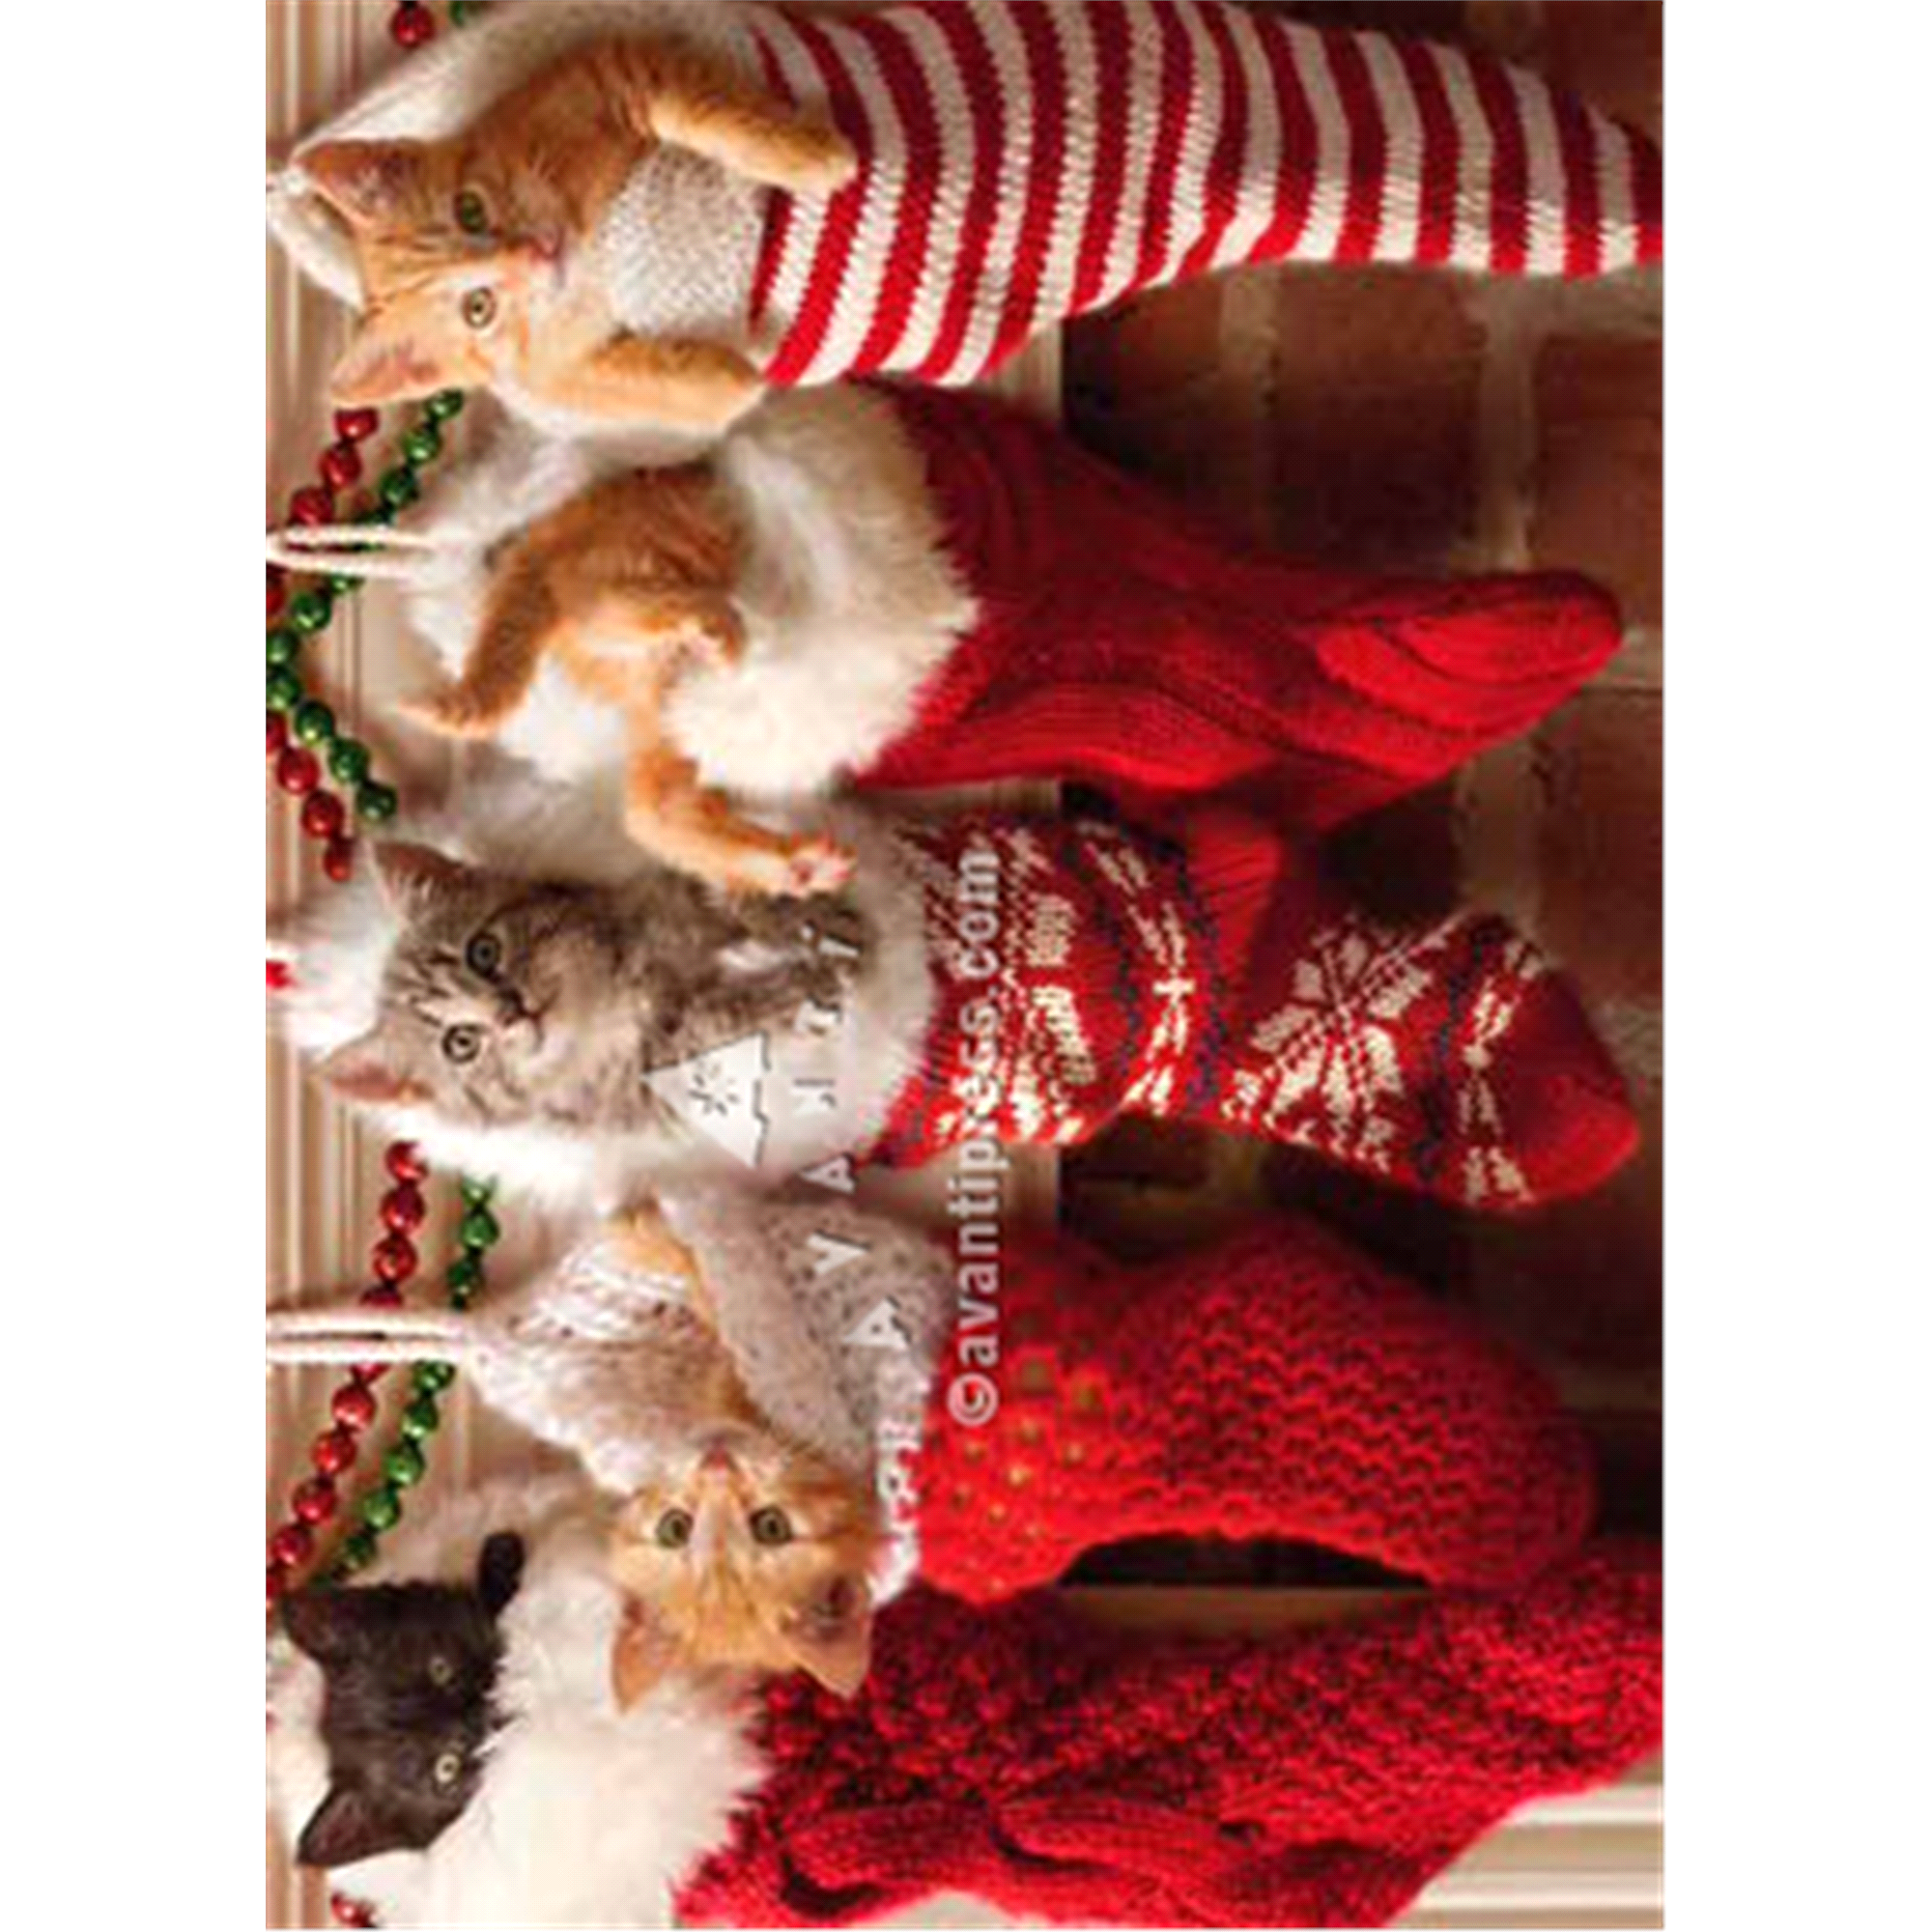 Boxed Christmas Cards Kittens in Christmas Stockings | Meijer.com